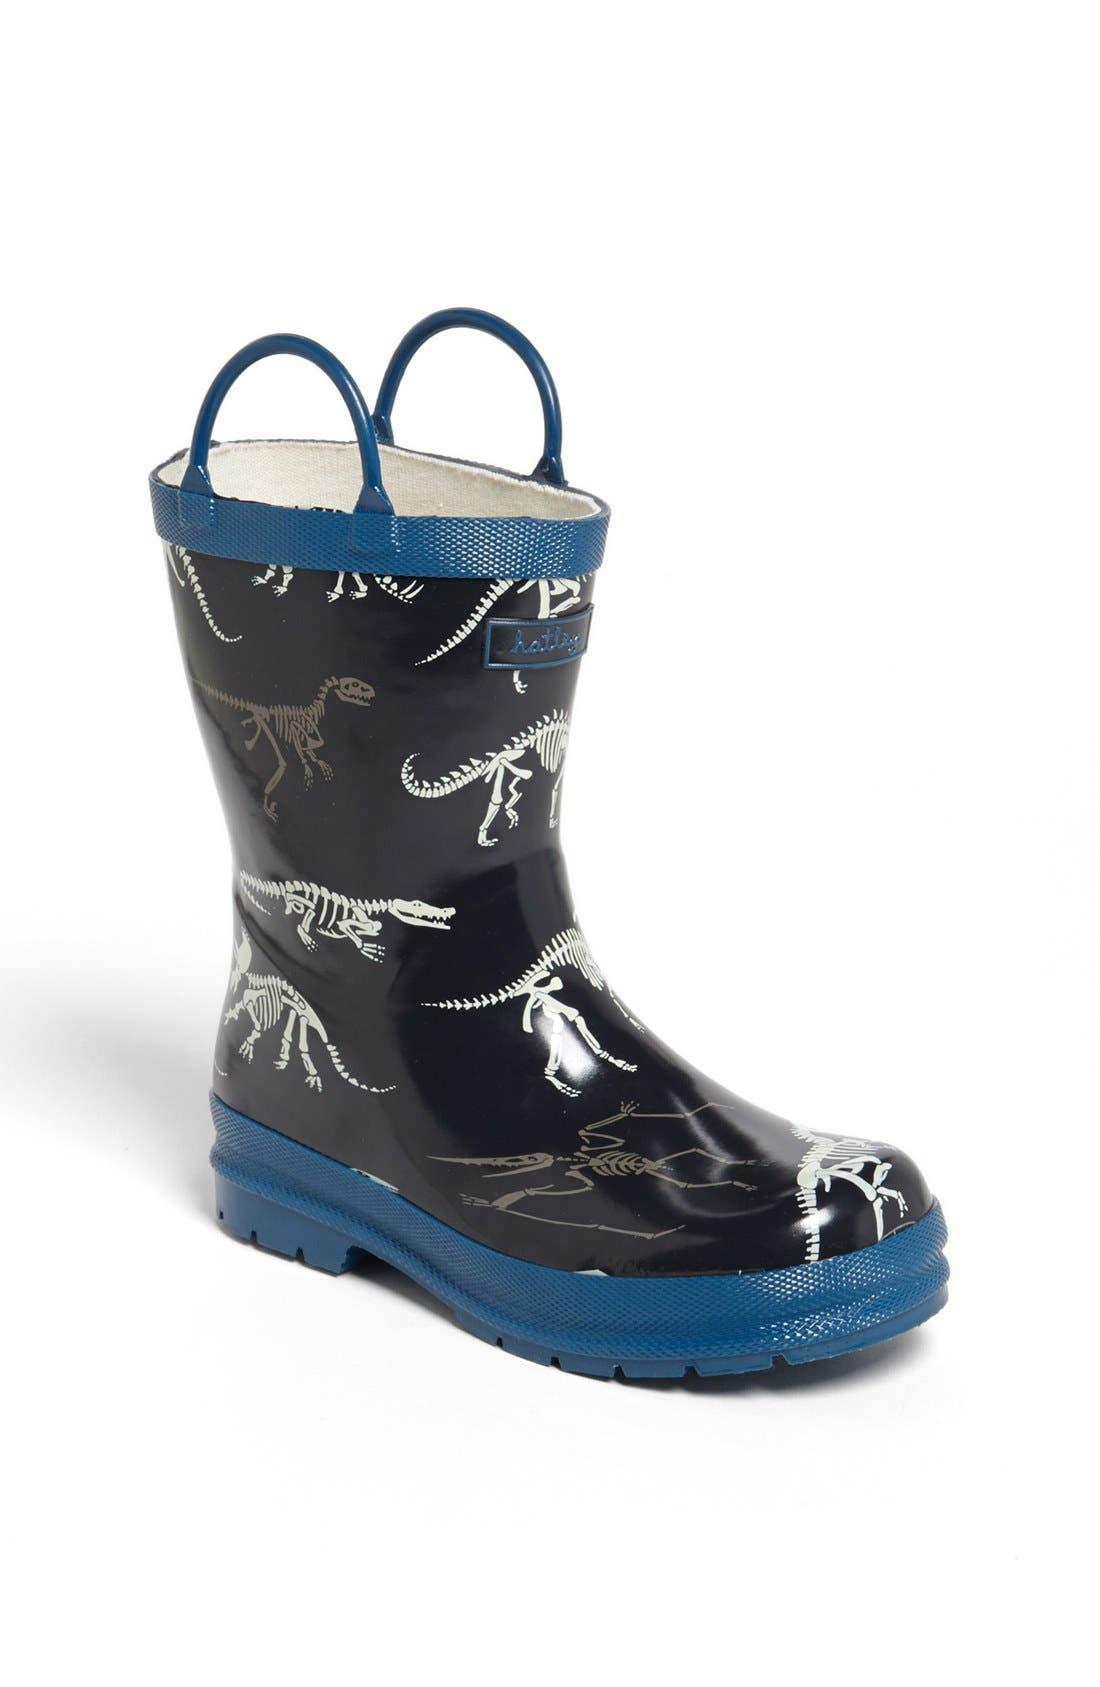 Alternate Image 1 Selected - Hatley 'Dino Bones' Rain Boot (Walker, Toddler & Little Kid)